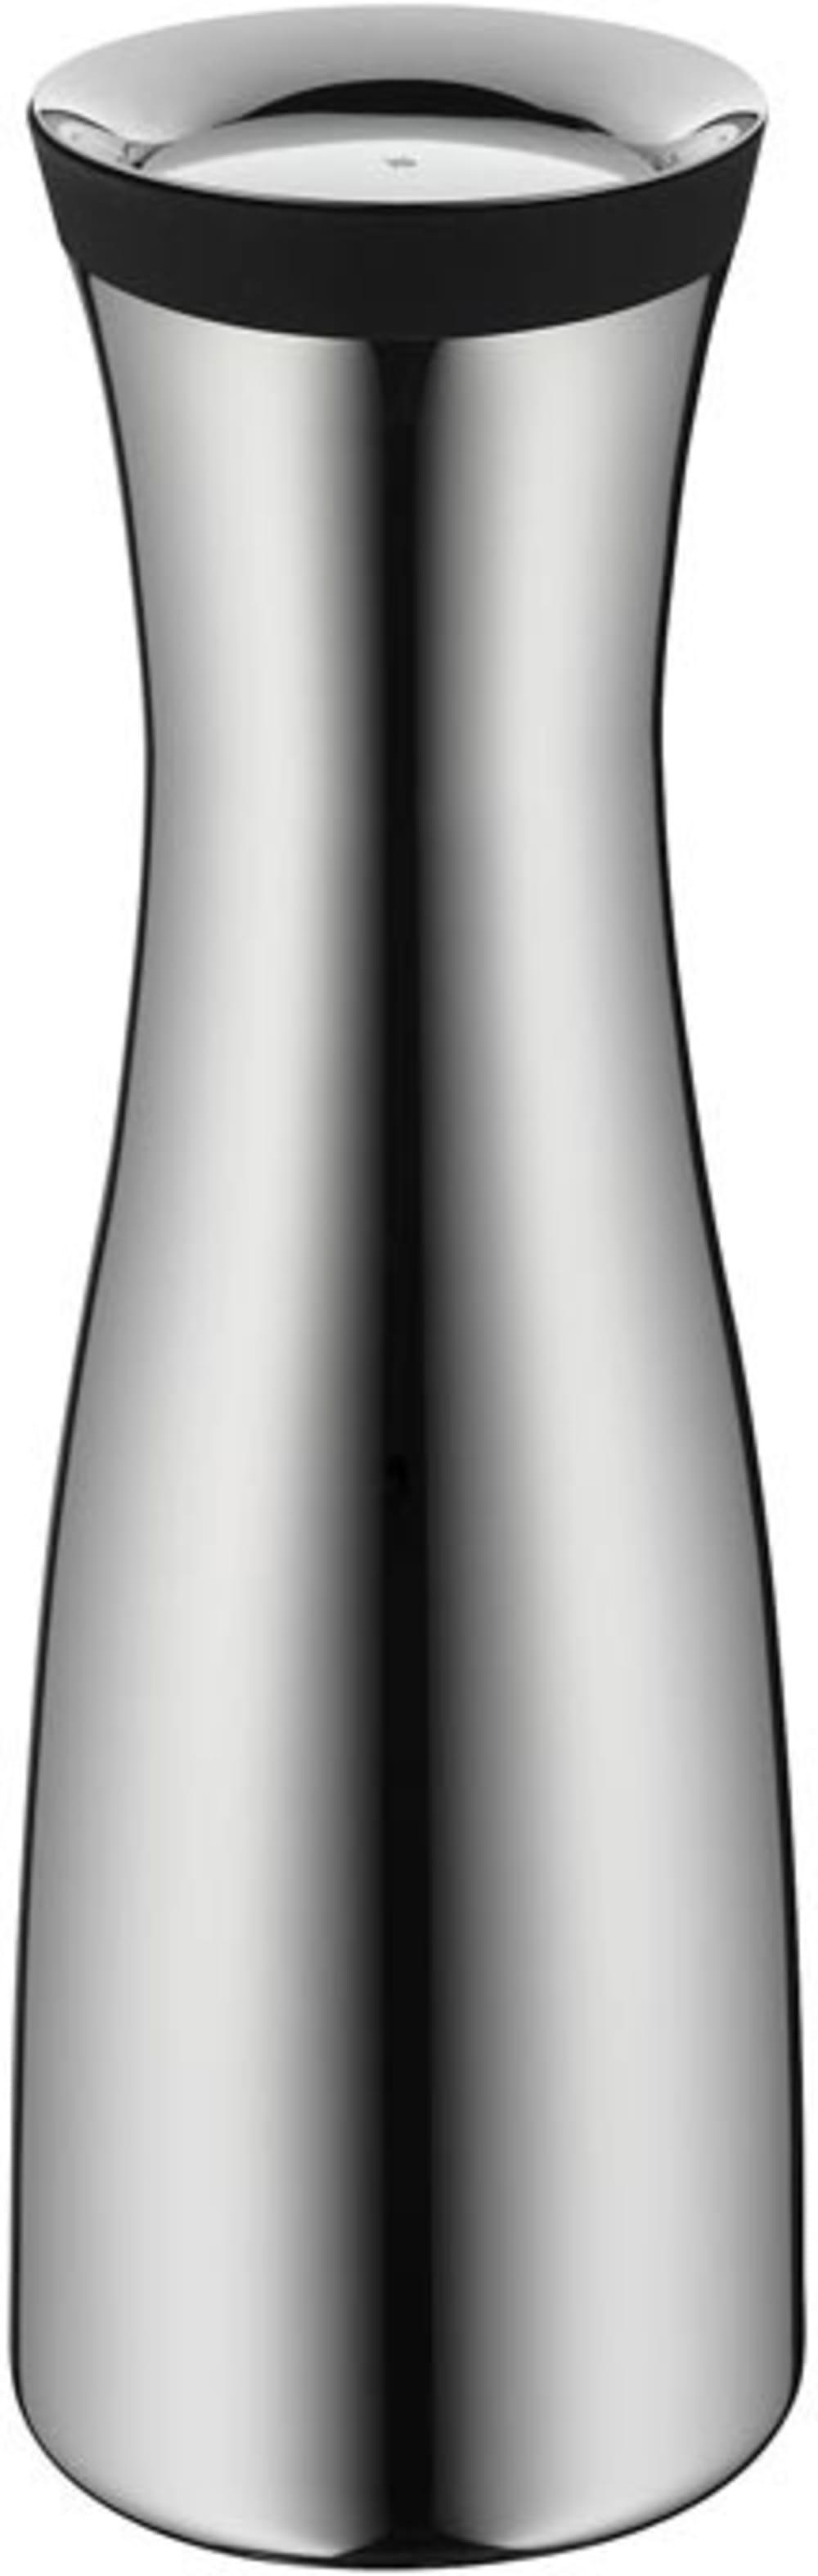 WMF - Karafka do wody 1 l stalowa, Basic